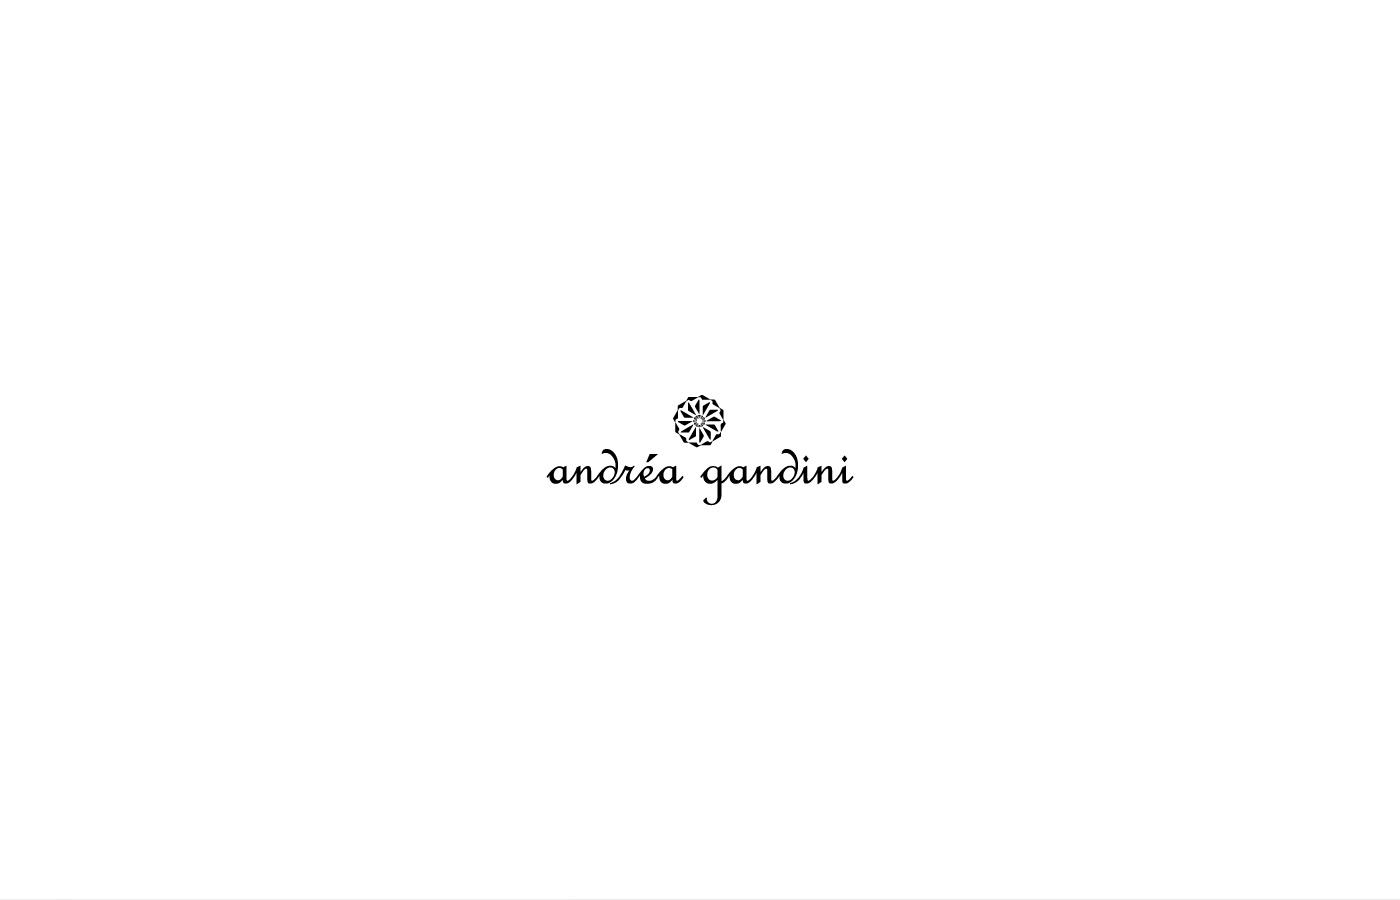 port-andrea-gandini-be-1400px-06